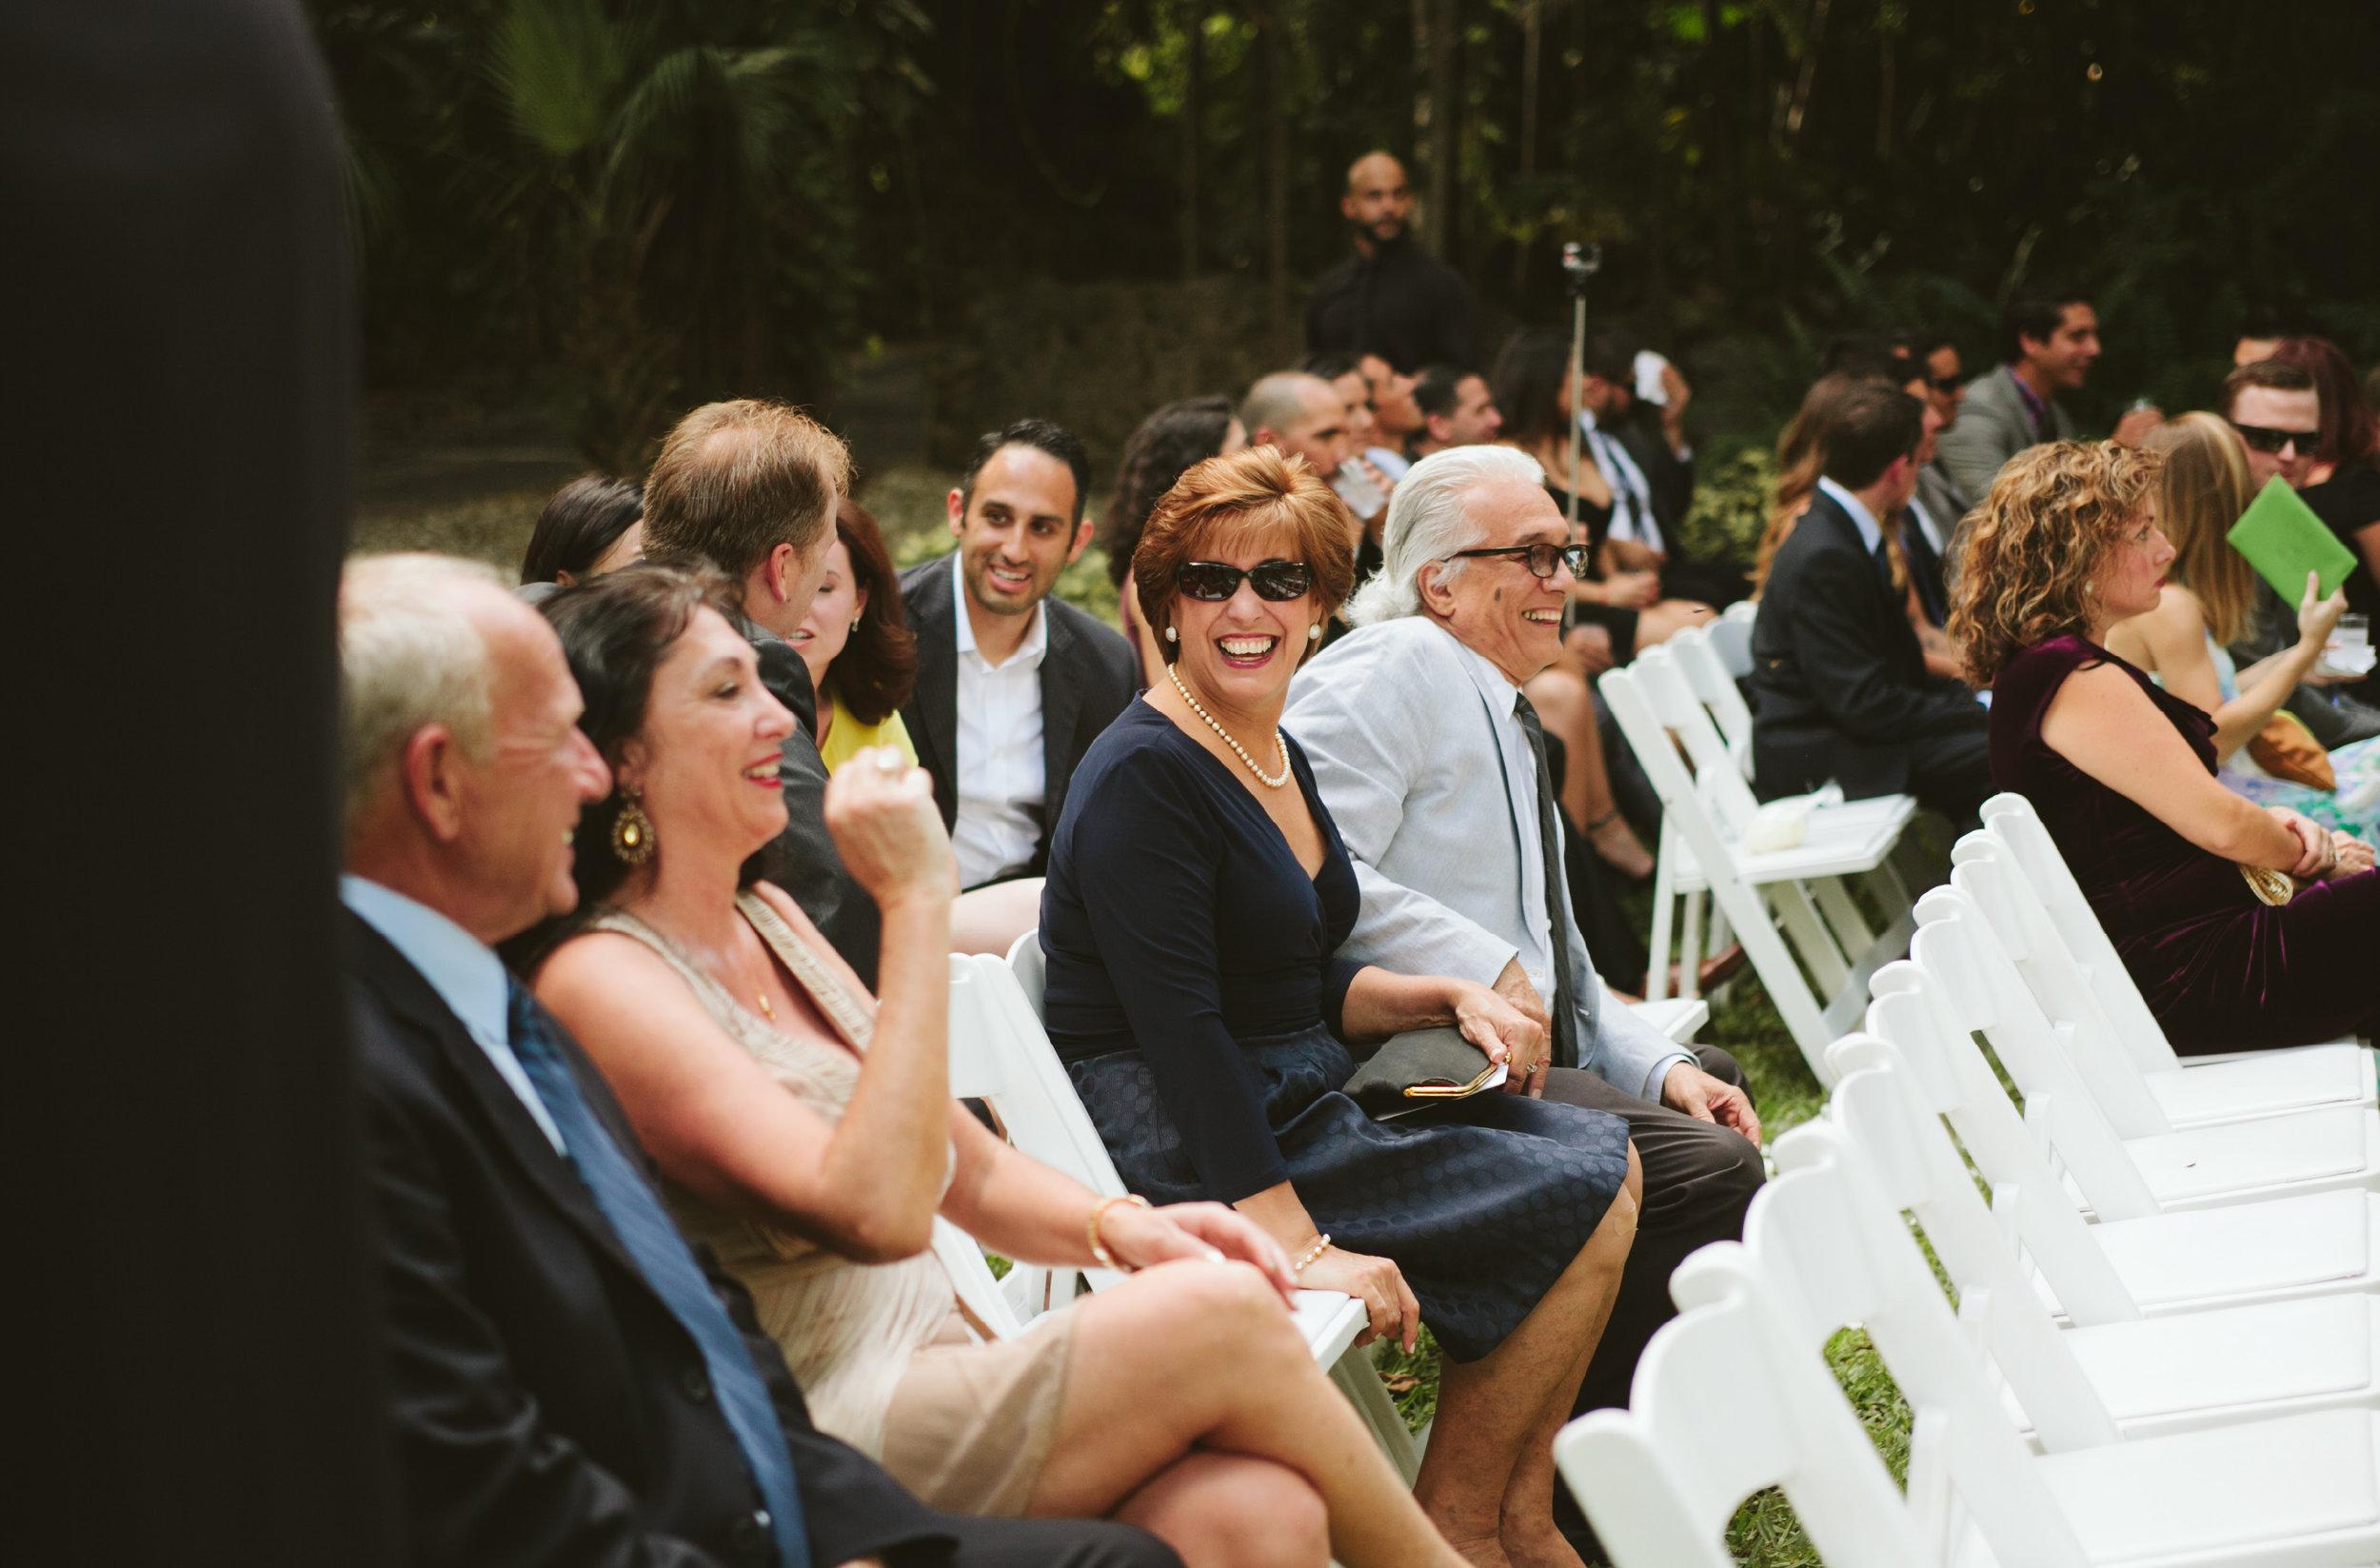 Meli + Mike Coconut Grove Wedding at Villa Woodbine41.jpg